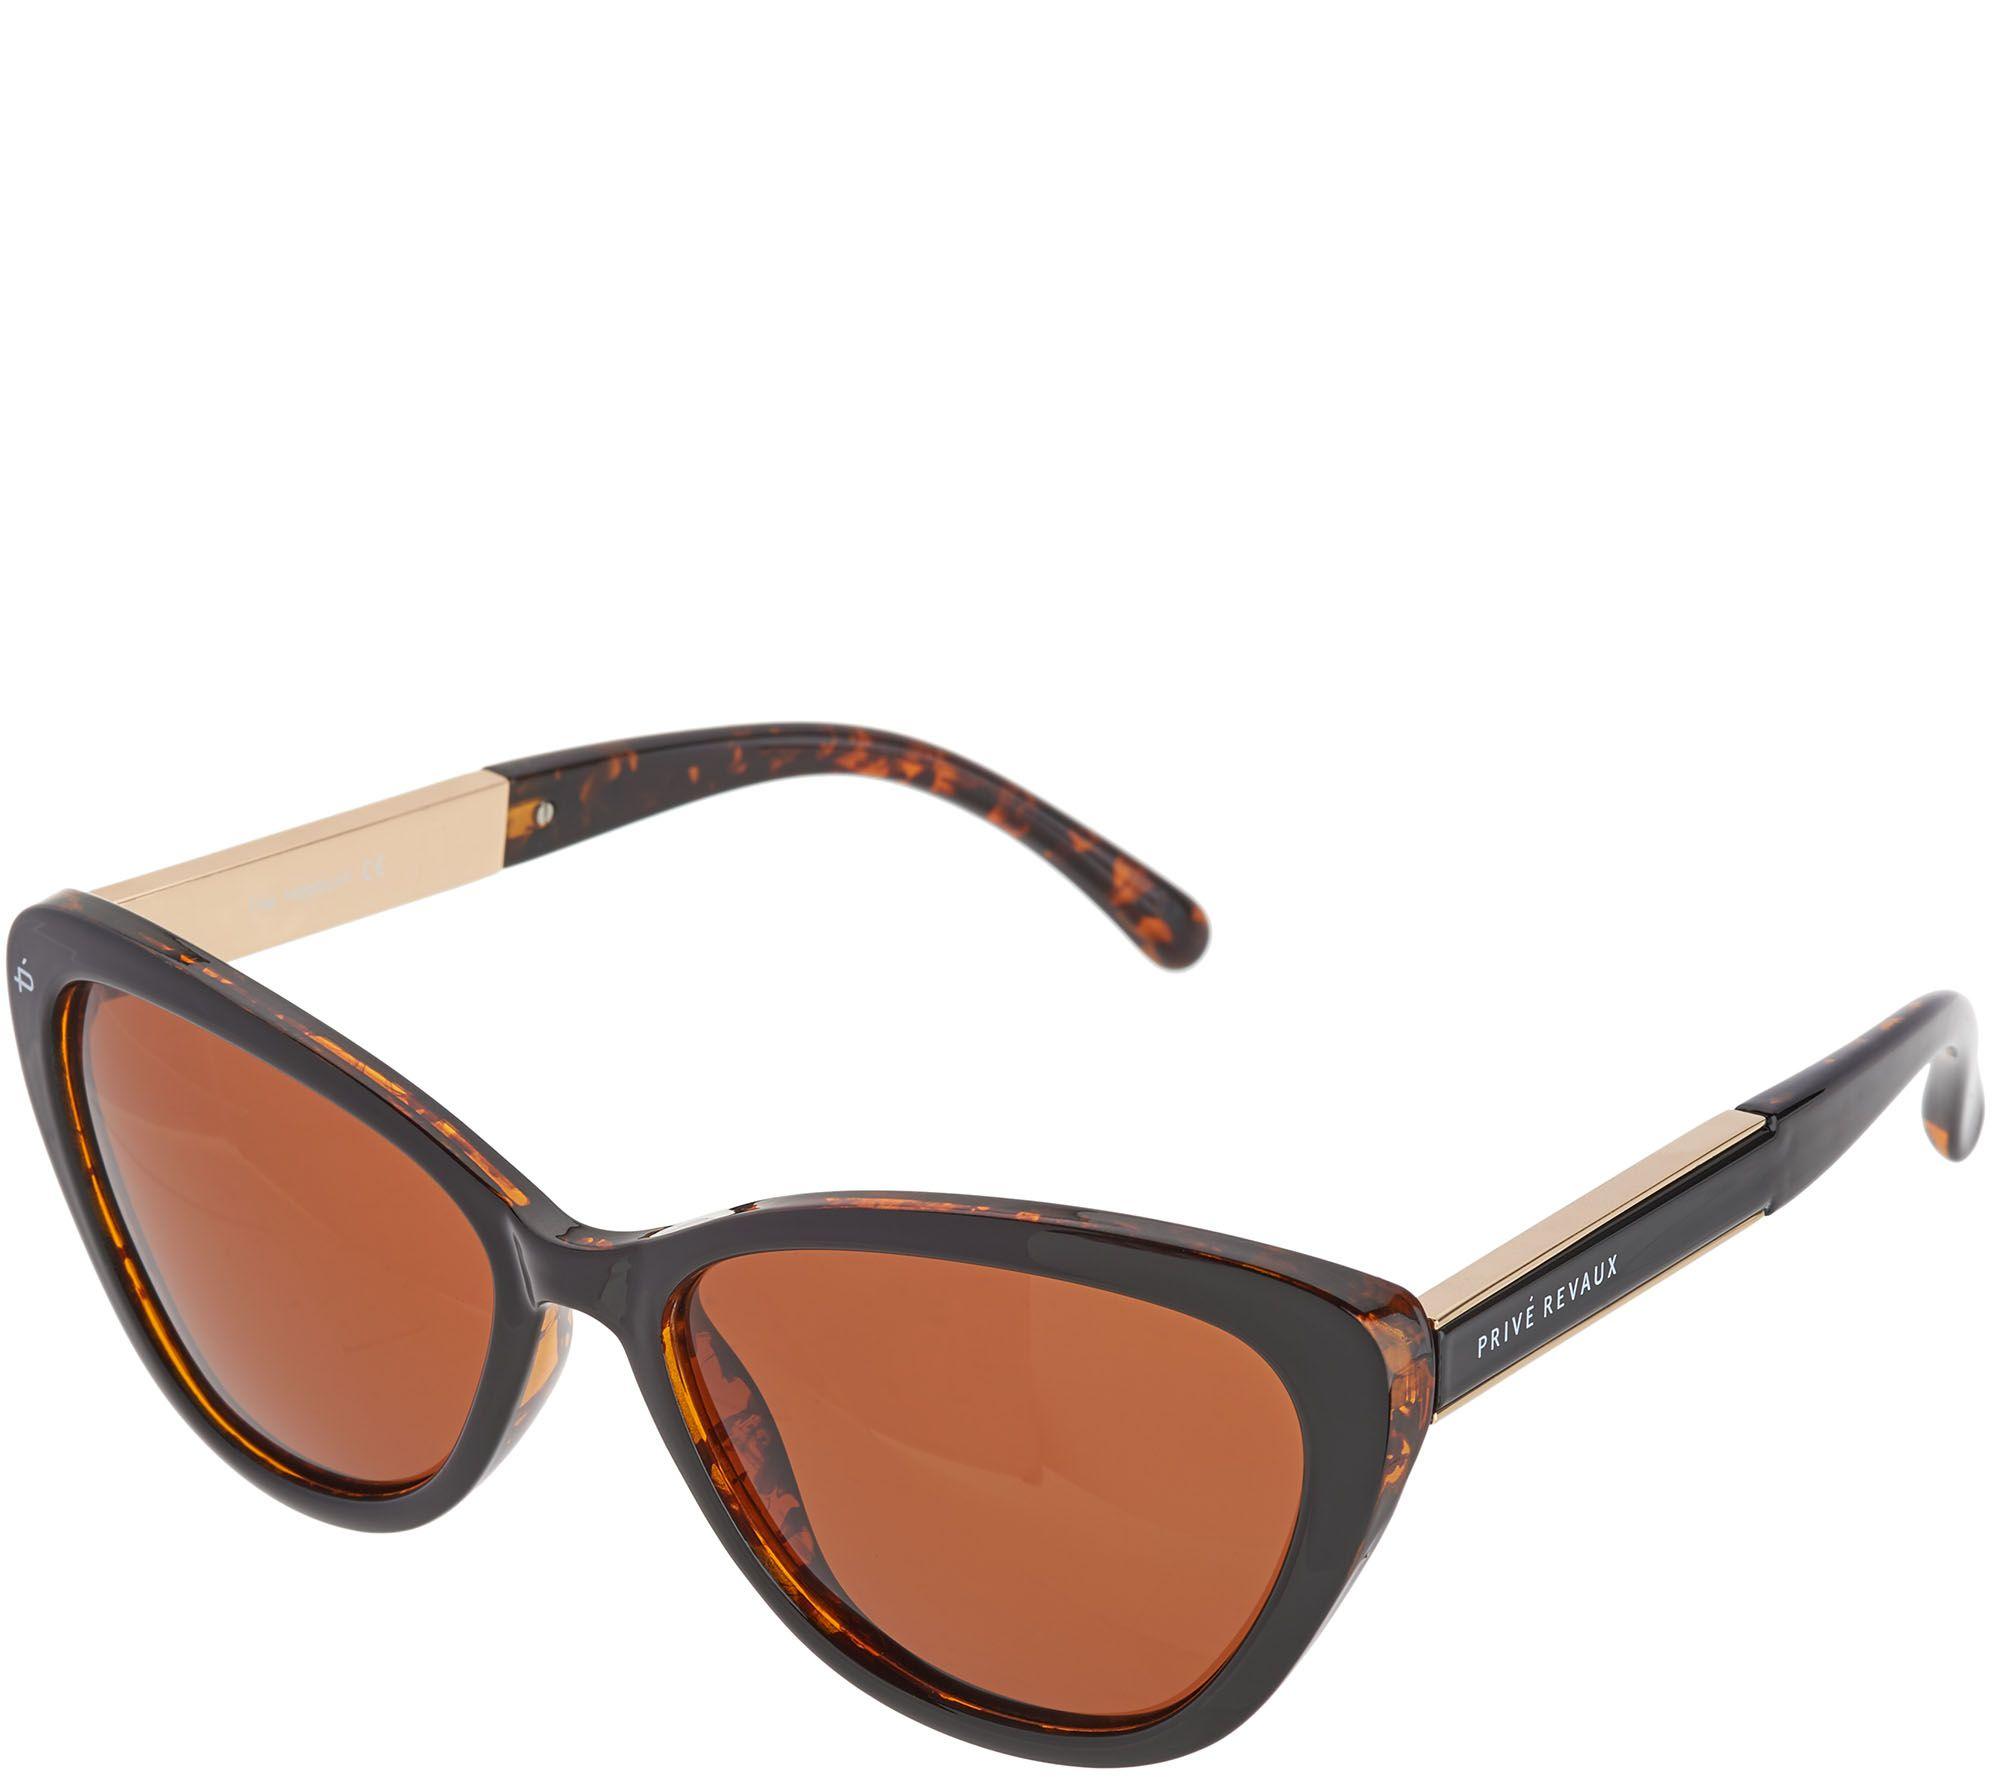 87b0f9c718338 Prive Revaux Hepburn Cat-Eye Polarized Sunglasses — QVC.com